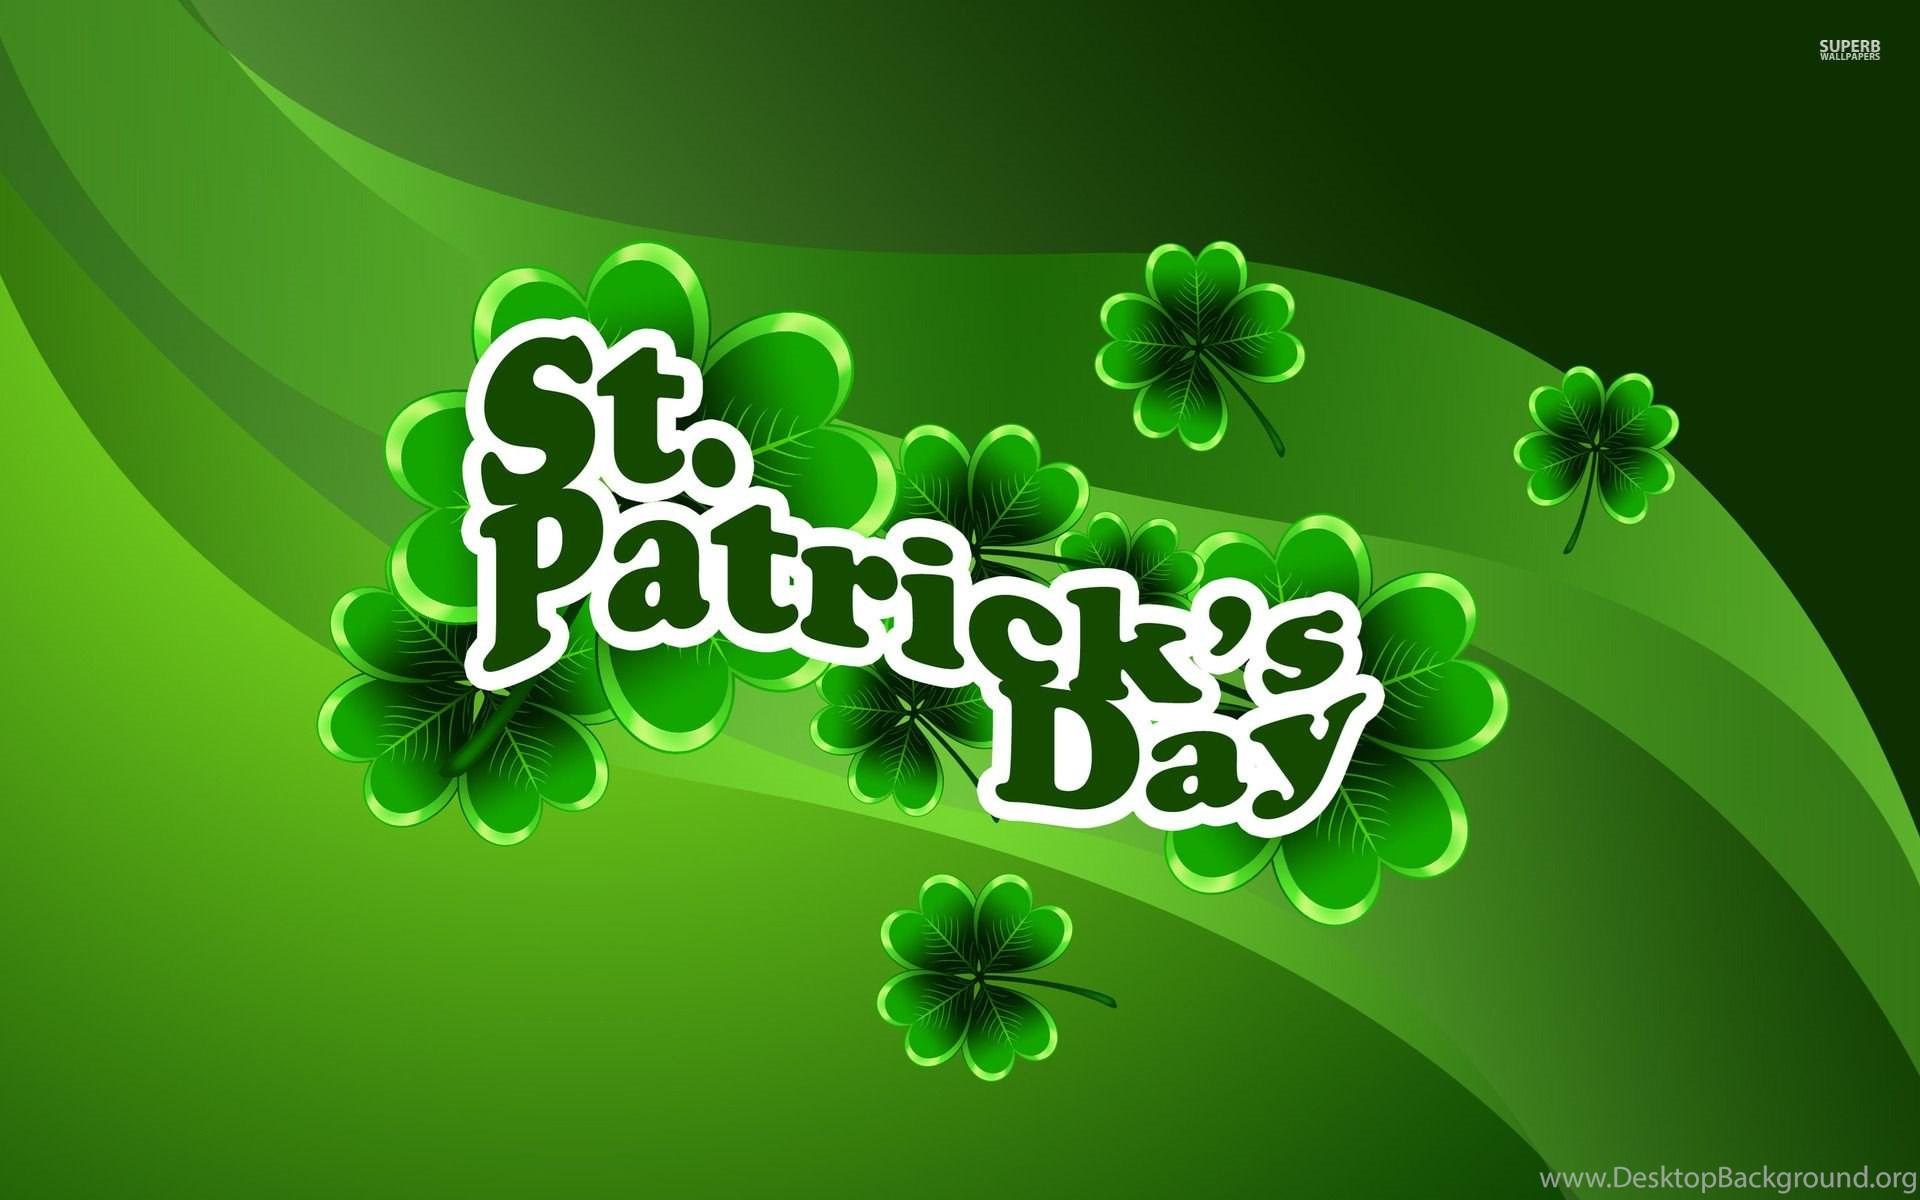 St Patricks Day Wallpaper Free Download Jpg Desktop Background